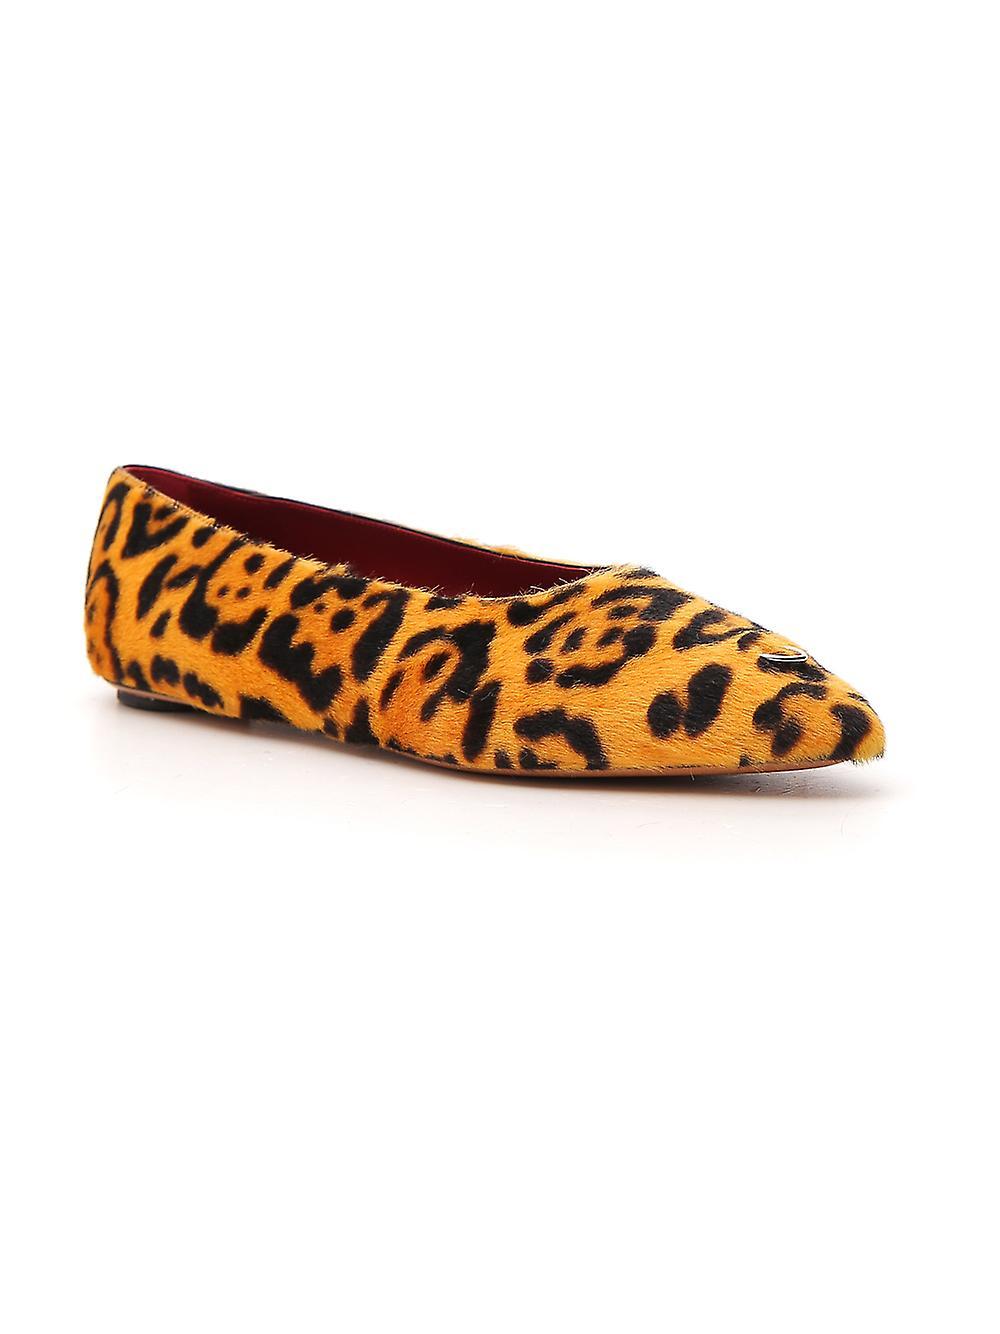 Marni Bams001300lv84600y65 Dames's Leopard Leather Flats uanBpa